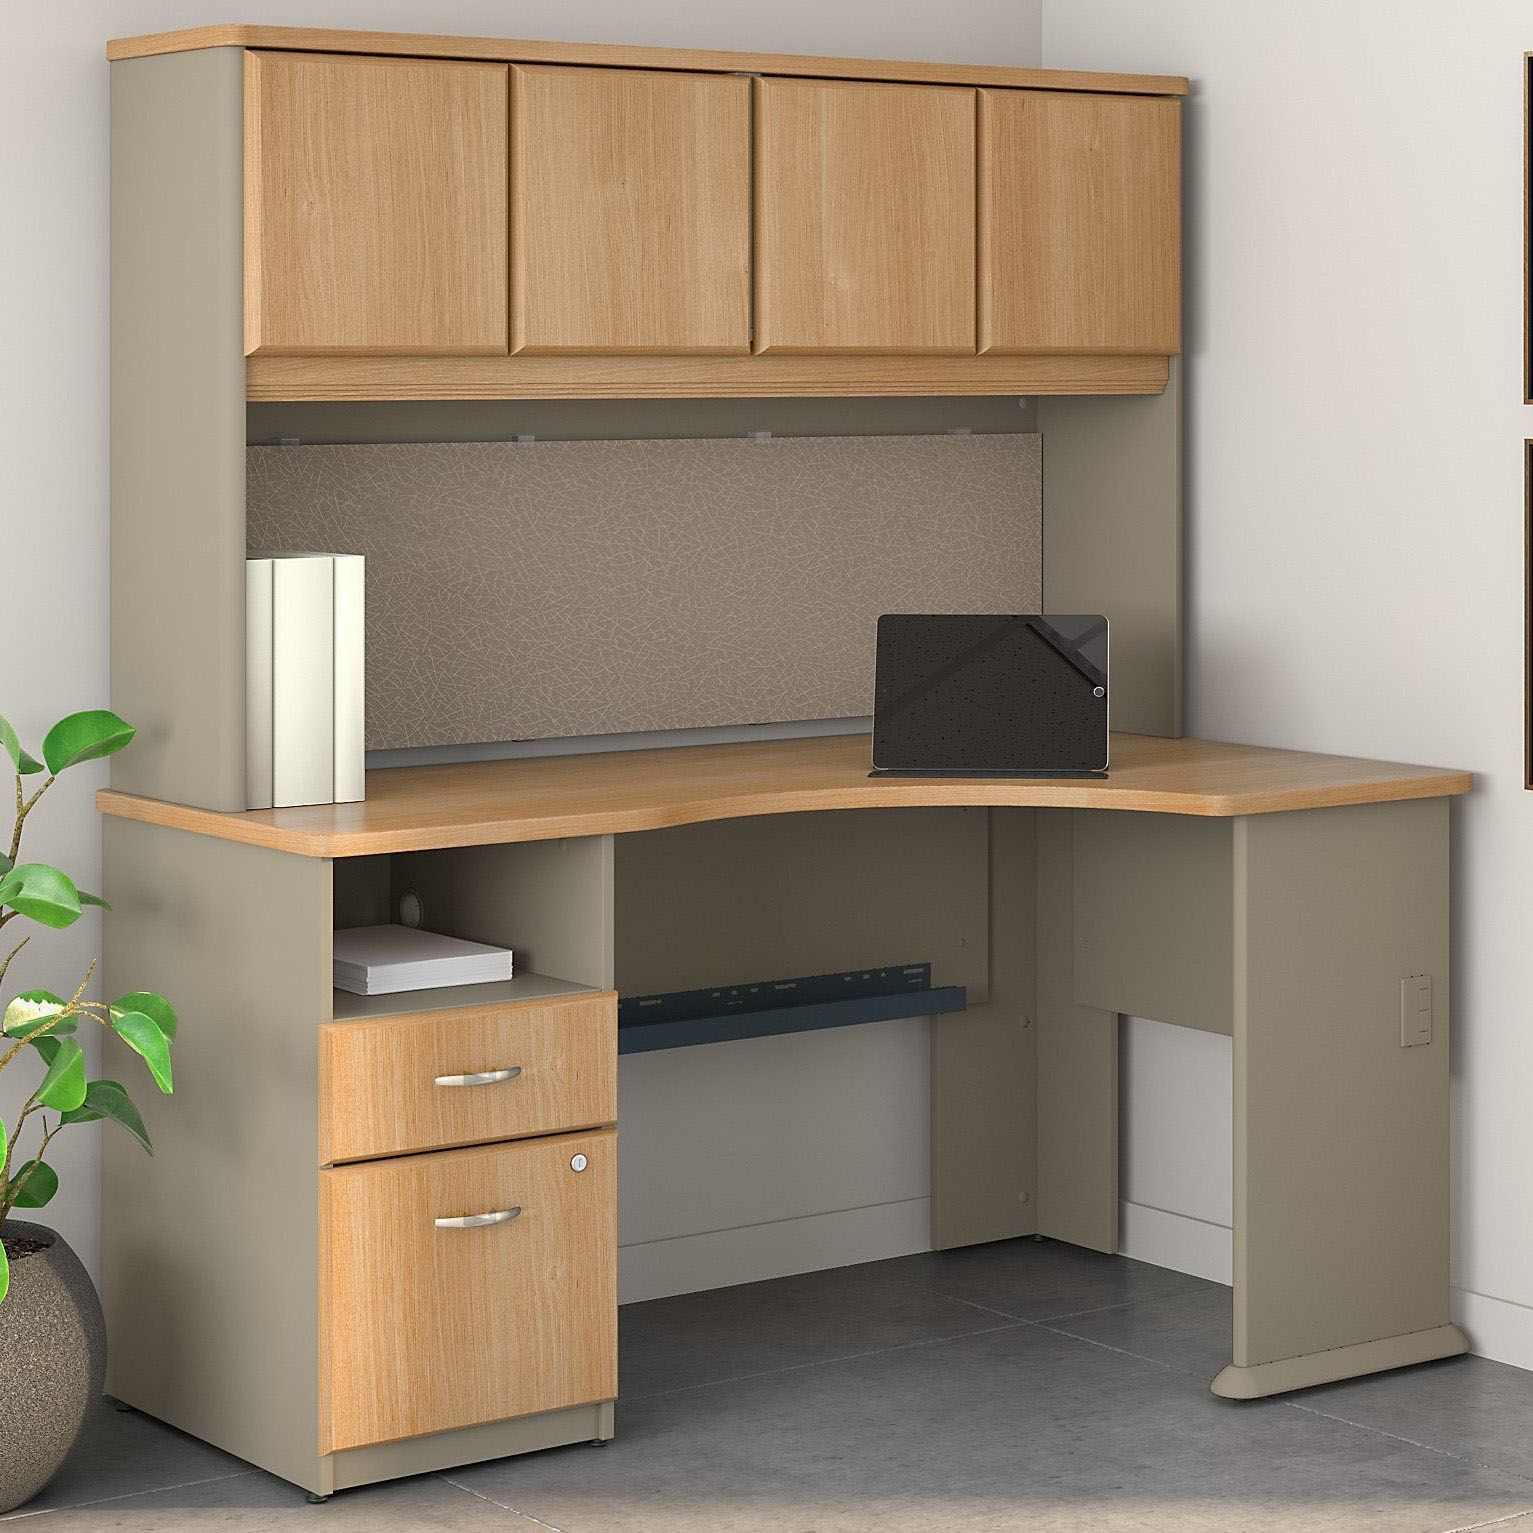 Wonderful Corner Desk Overstock Exclusive On Interioropedia Com Modular Home Office Furniture Modern Office Furniture Desk L Shaped Corner Desk